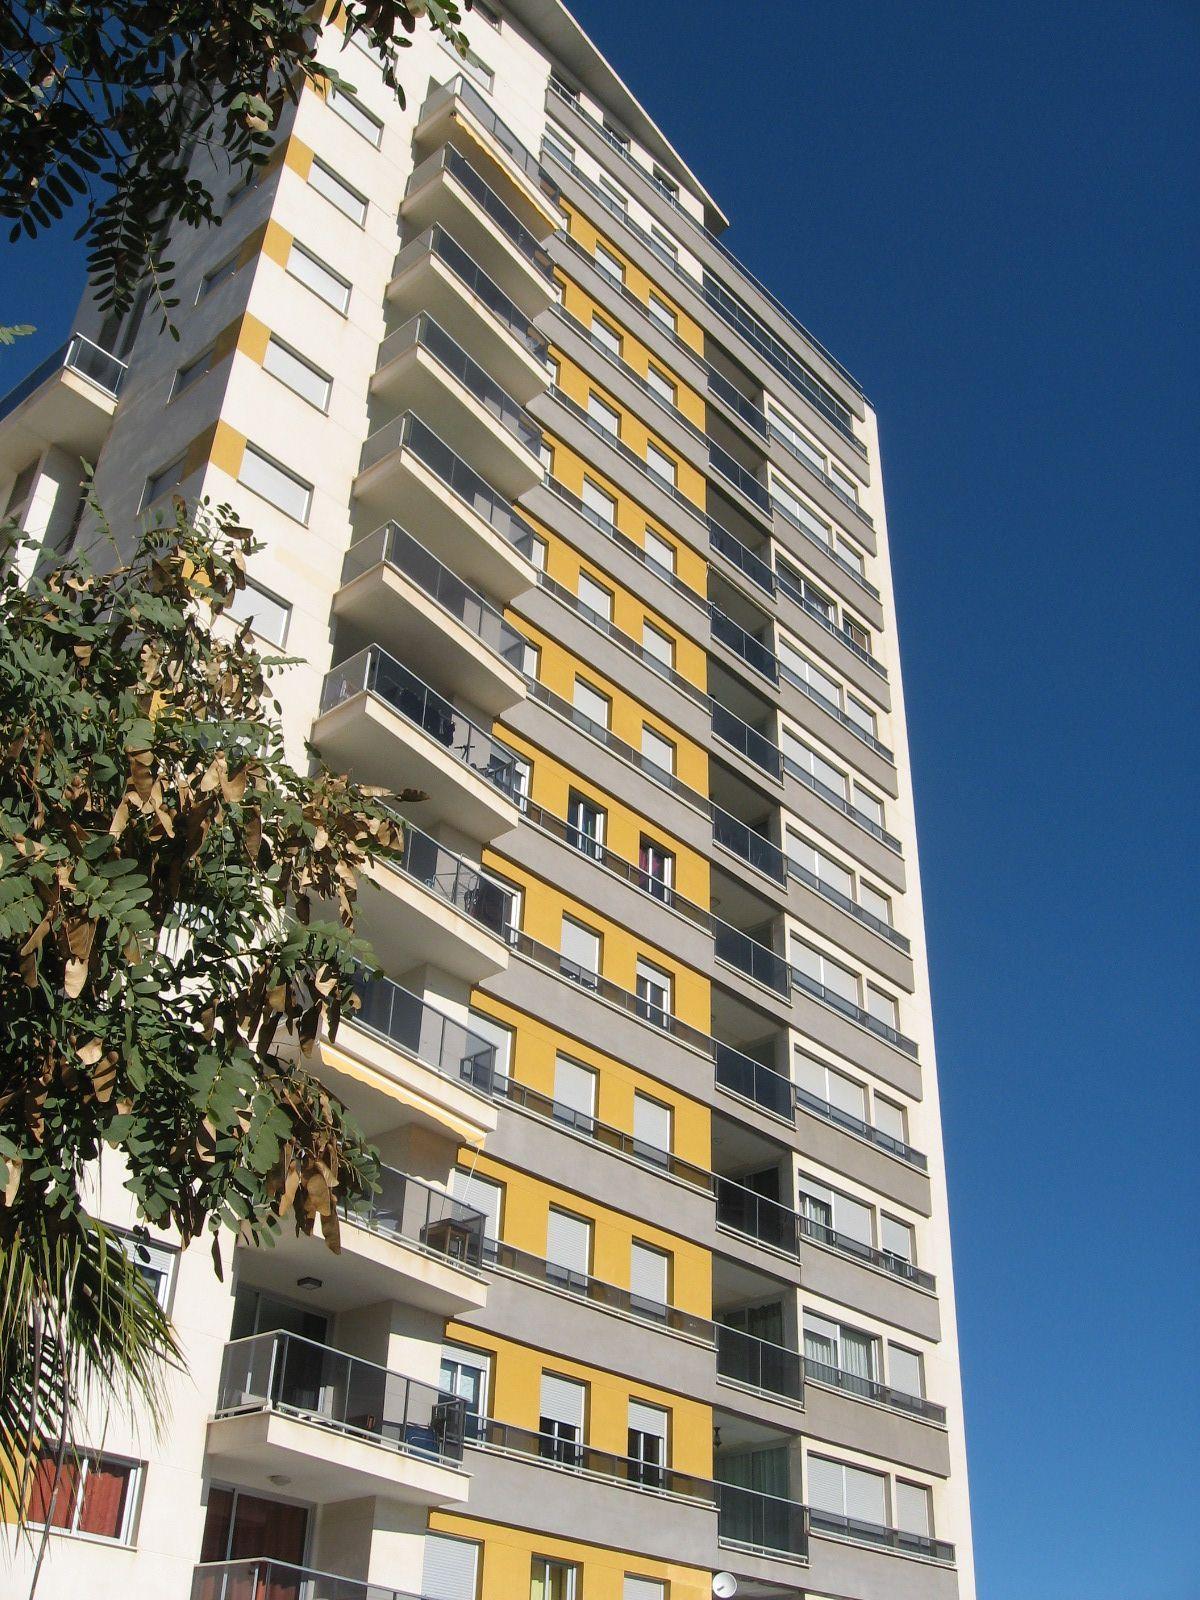 Appartement in Calpe / Calp, EDIF COSTA CALPE, te koop